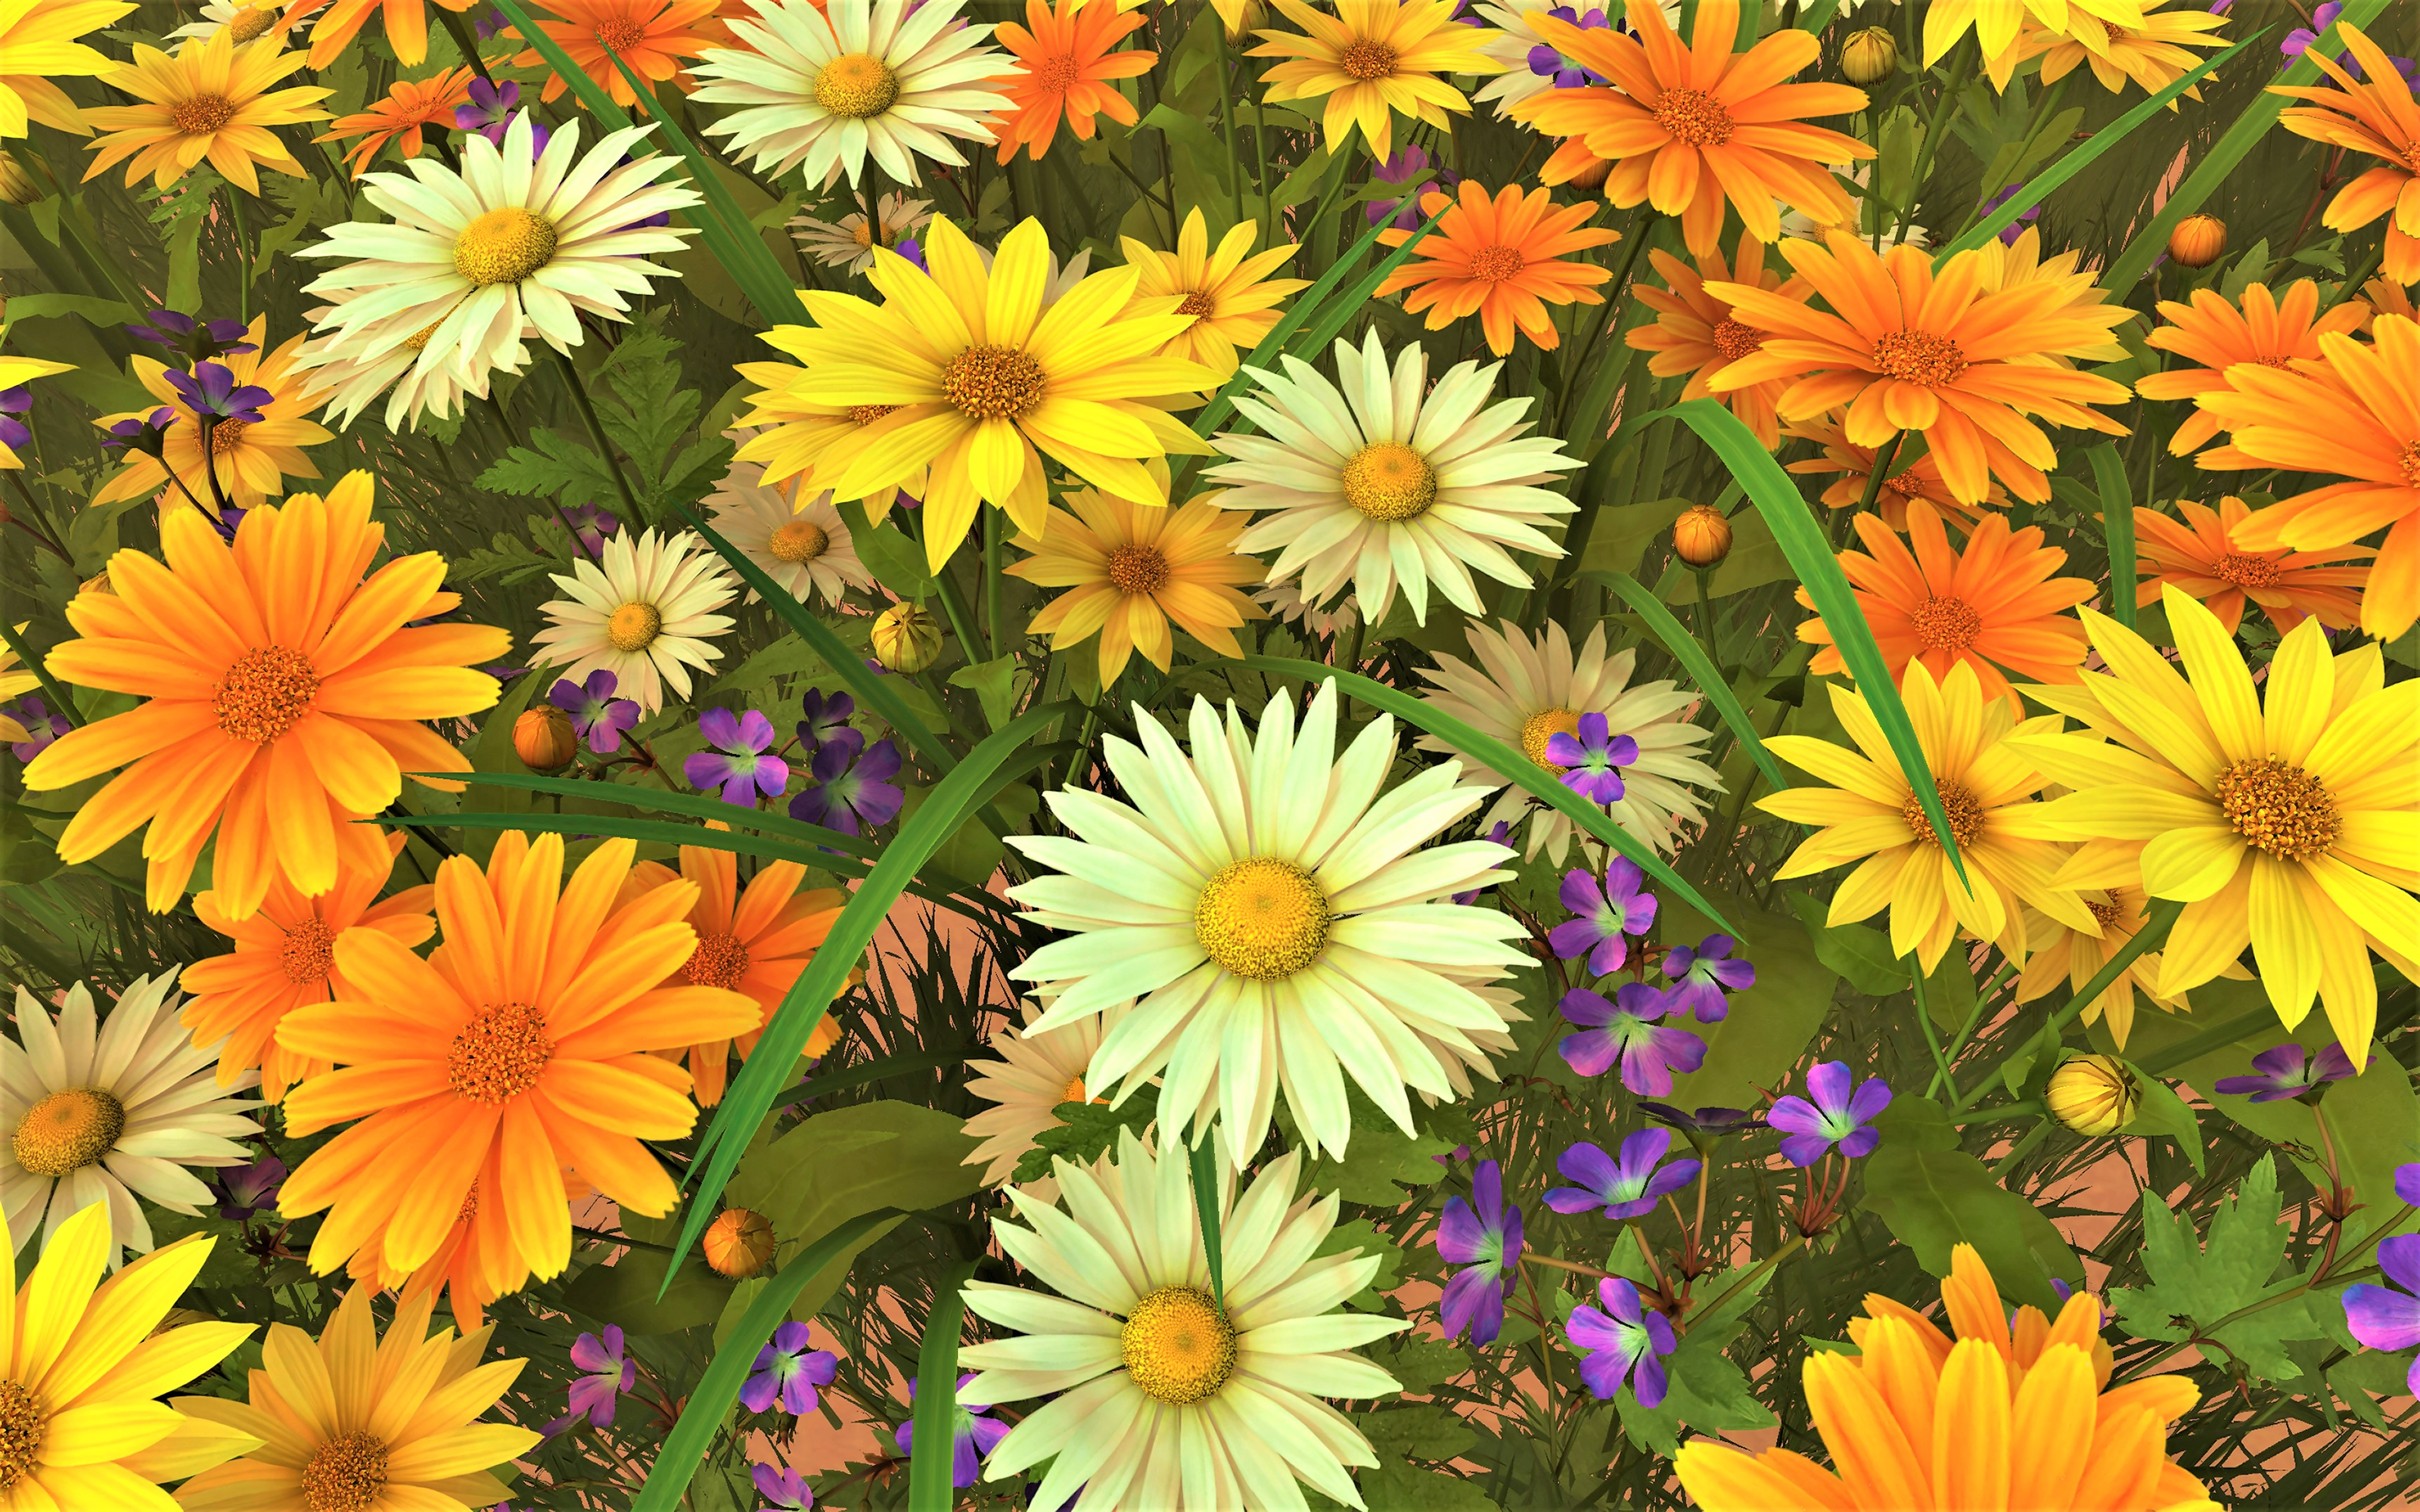 Daisy Flower Gerbera White Flower Yellow Flower 3840x2400